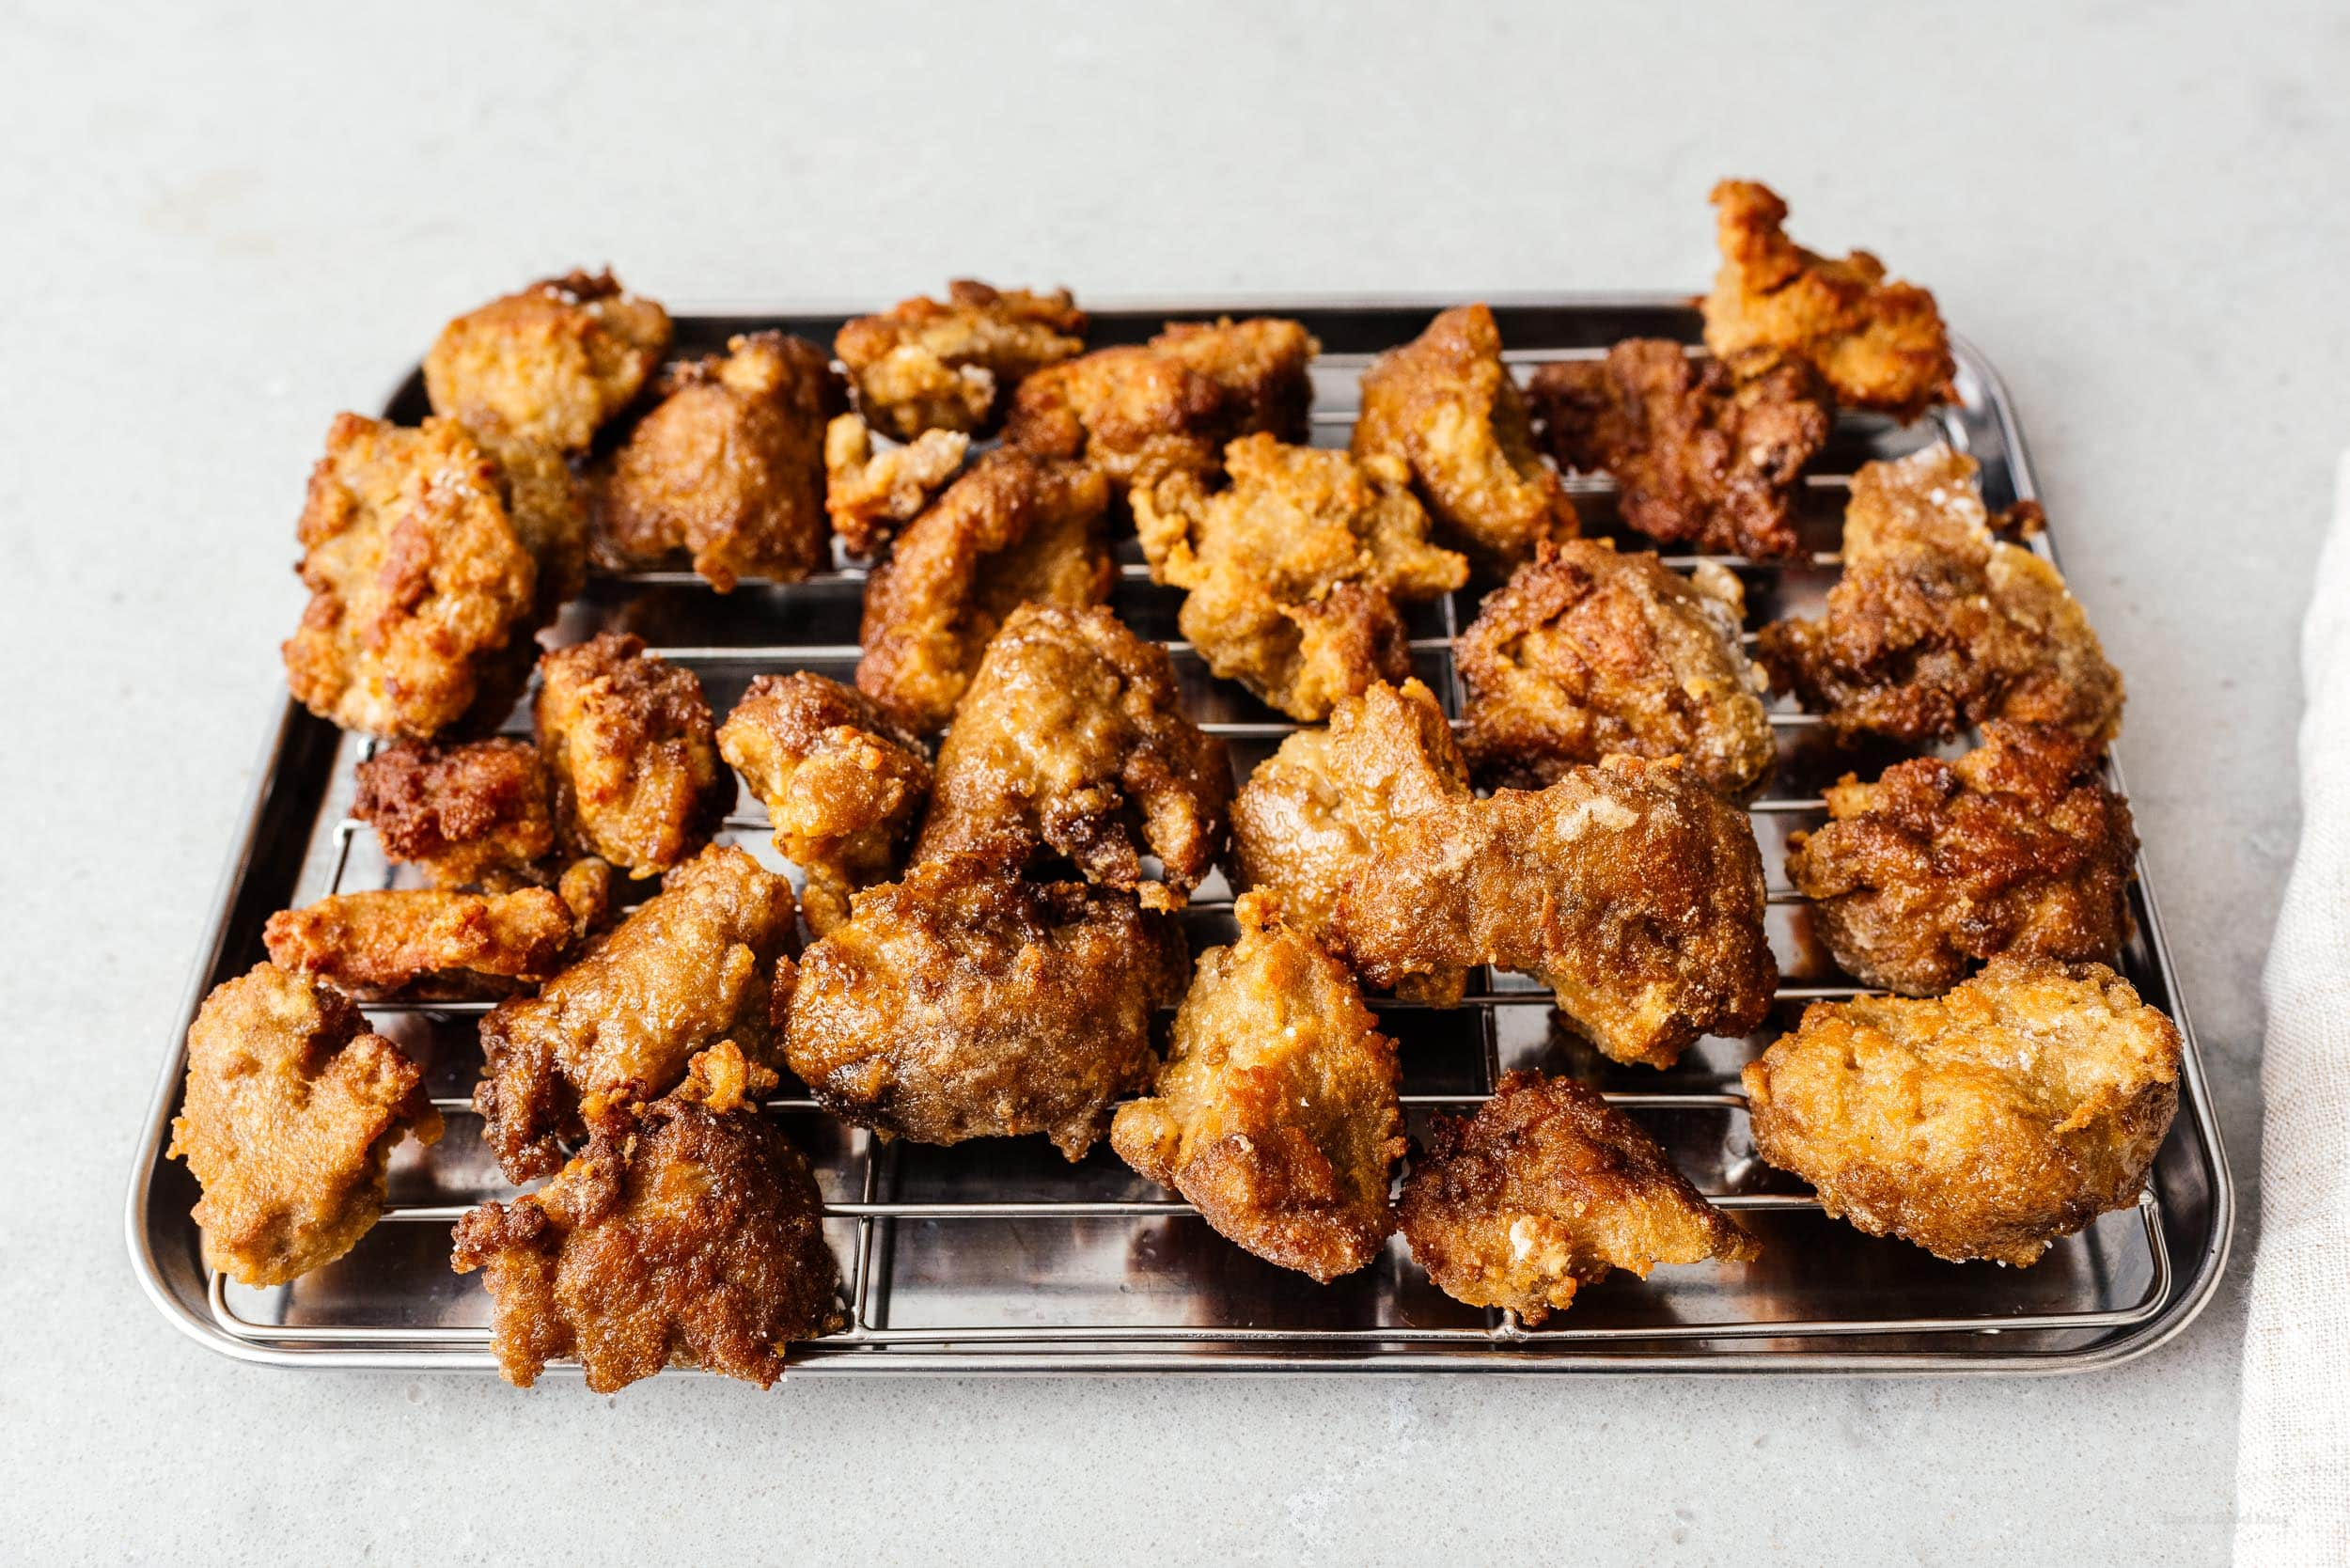 seitan recipe | www.iamafoodblog.com